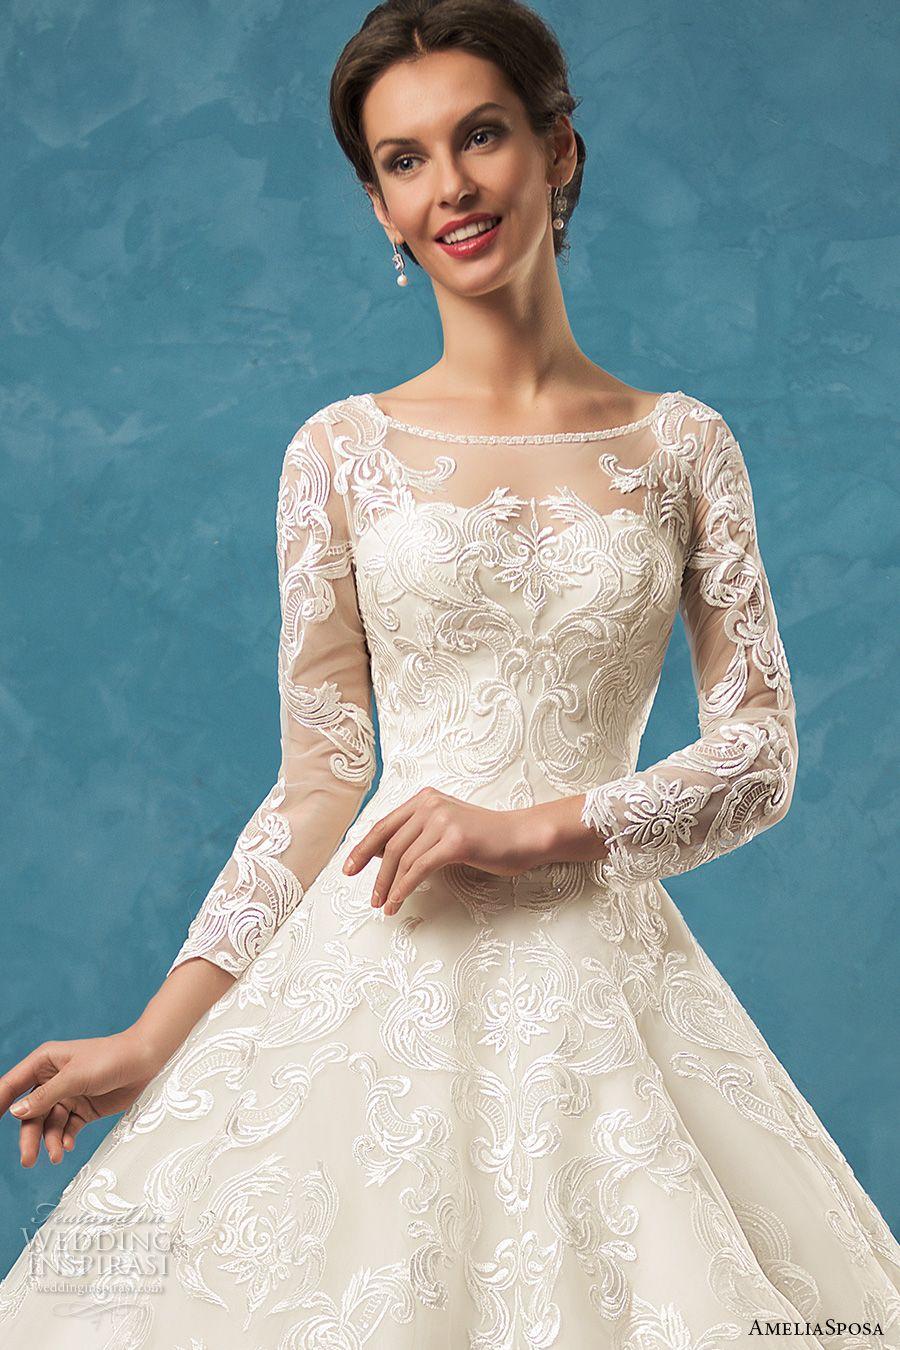 Amelia Sposa 2017 Wedding Dresses | Amelia sposa, Lace bodice and Amelia